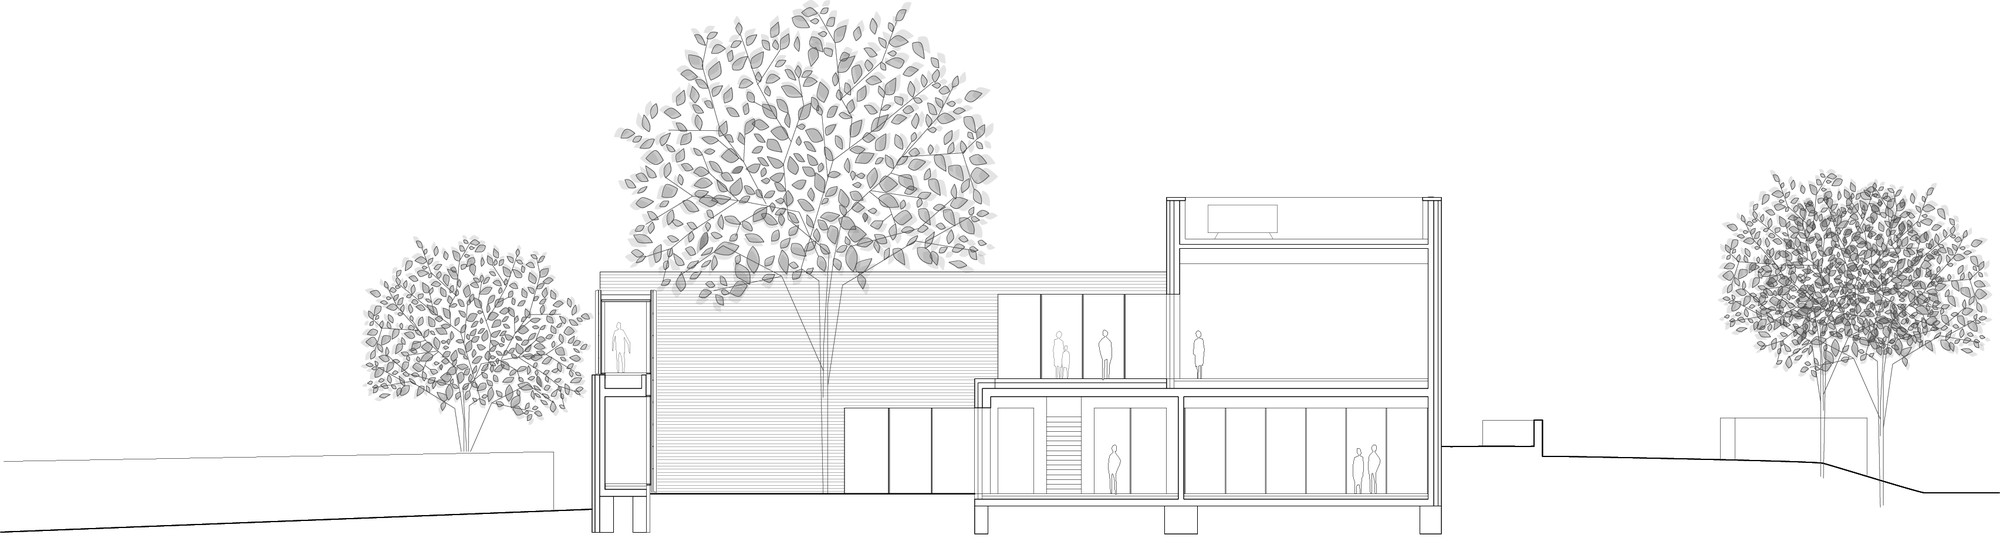 galer a de museo luthers sterbehaus von m 21. Black Bedroom Furniture Sets. Home Design Ideas